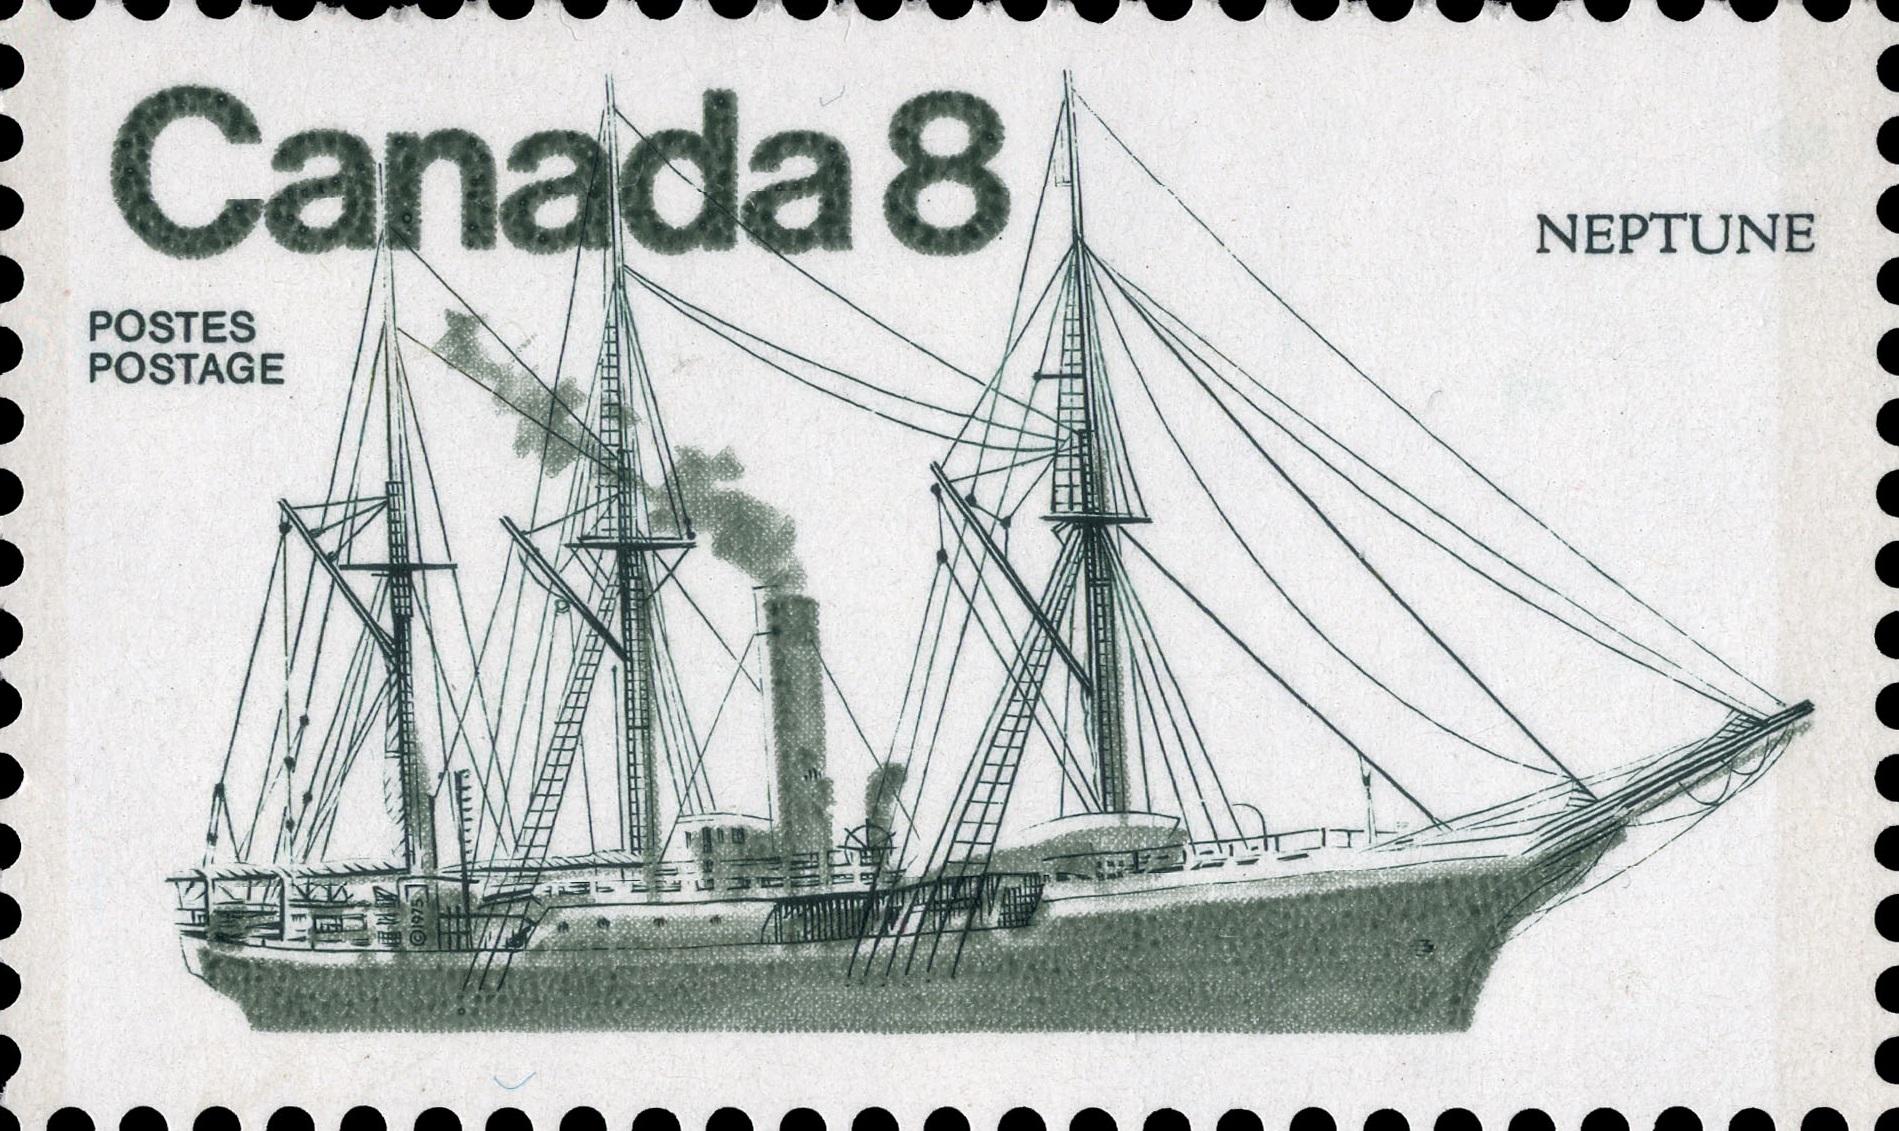 Neptune Canada Postage Stamp